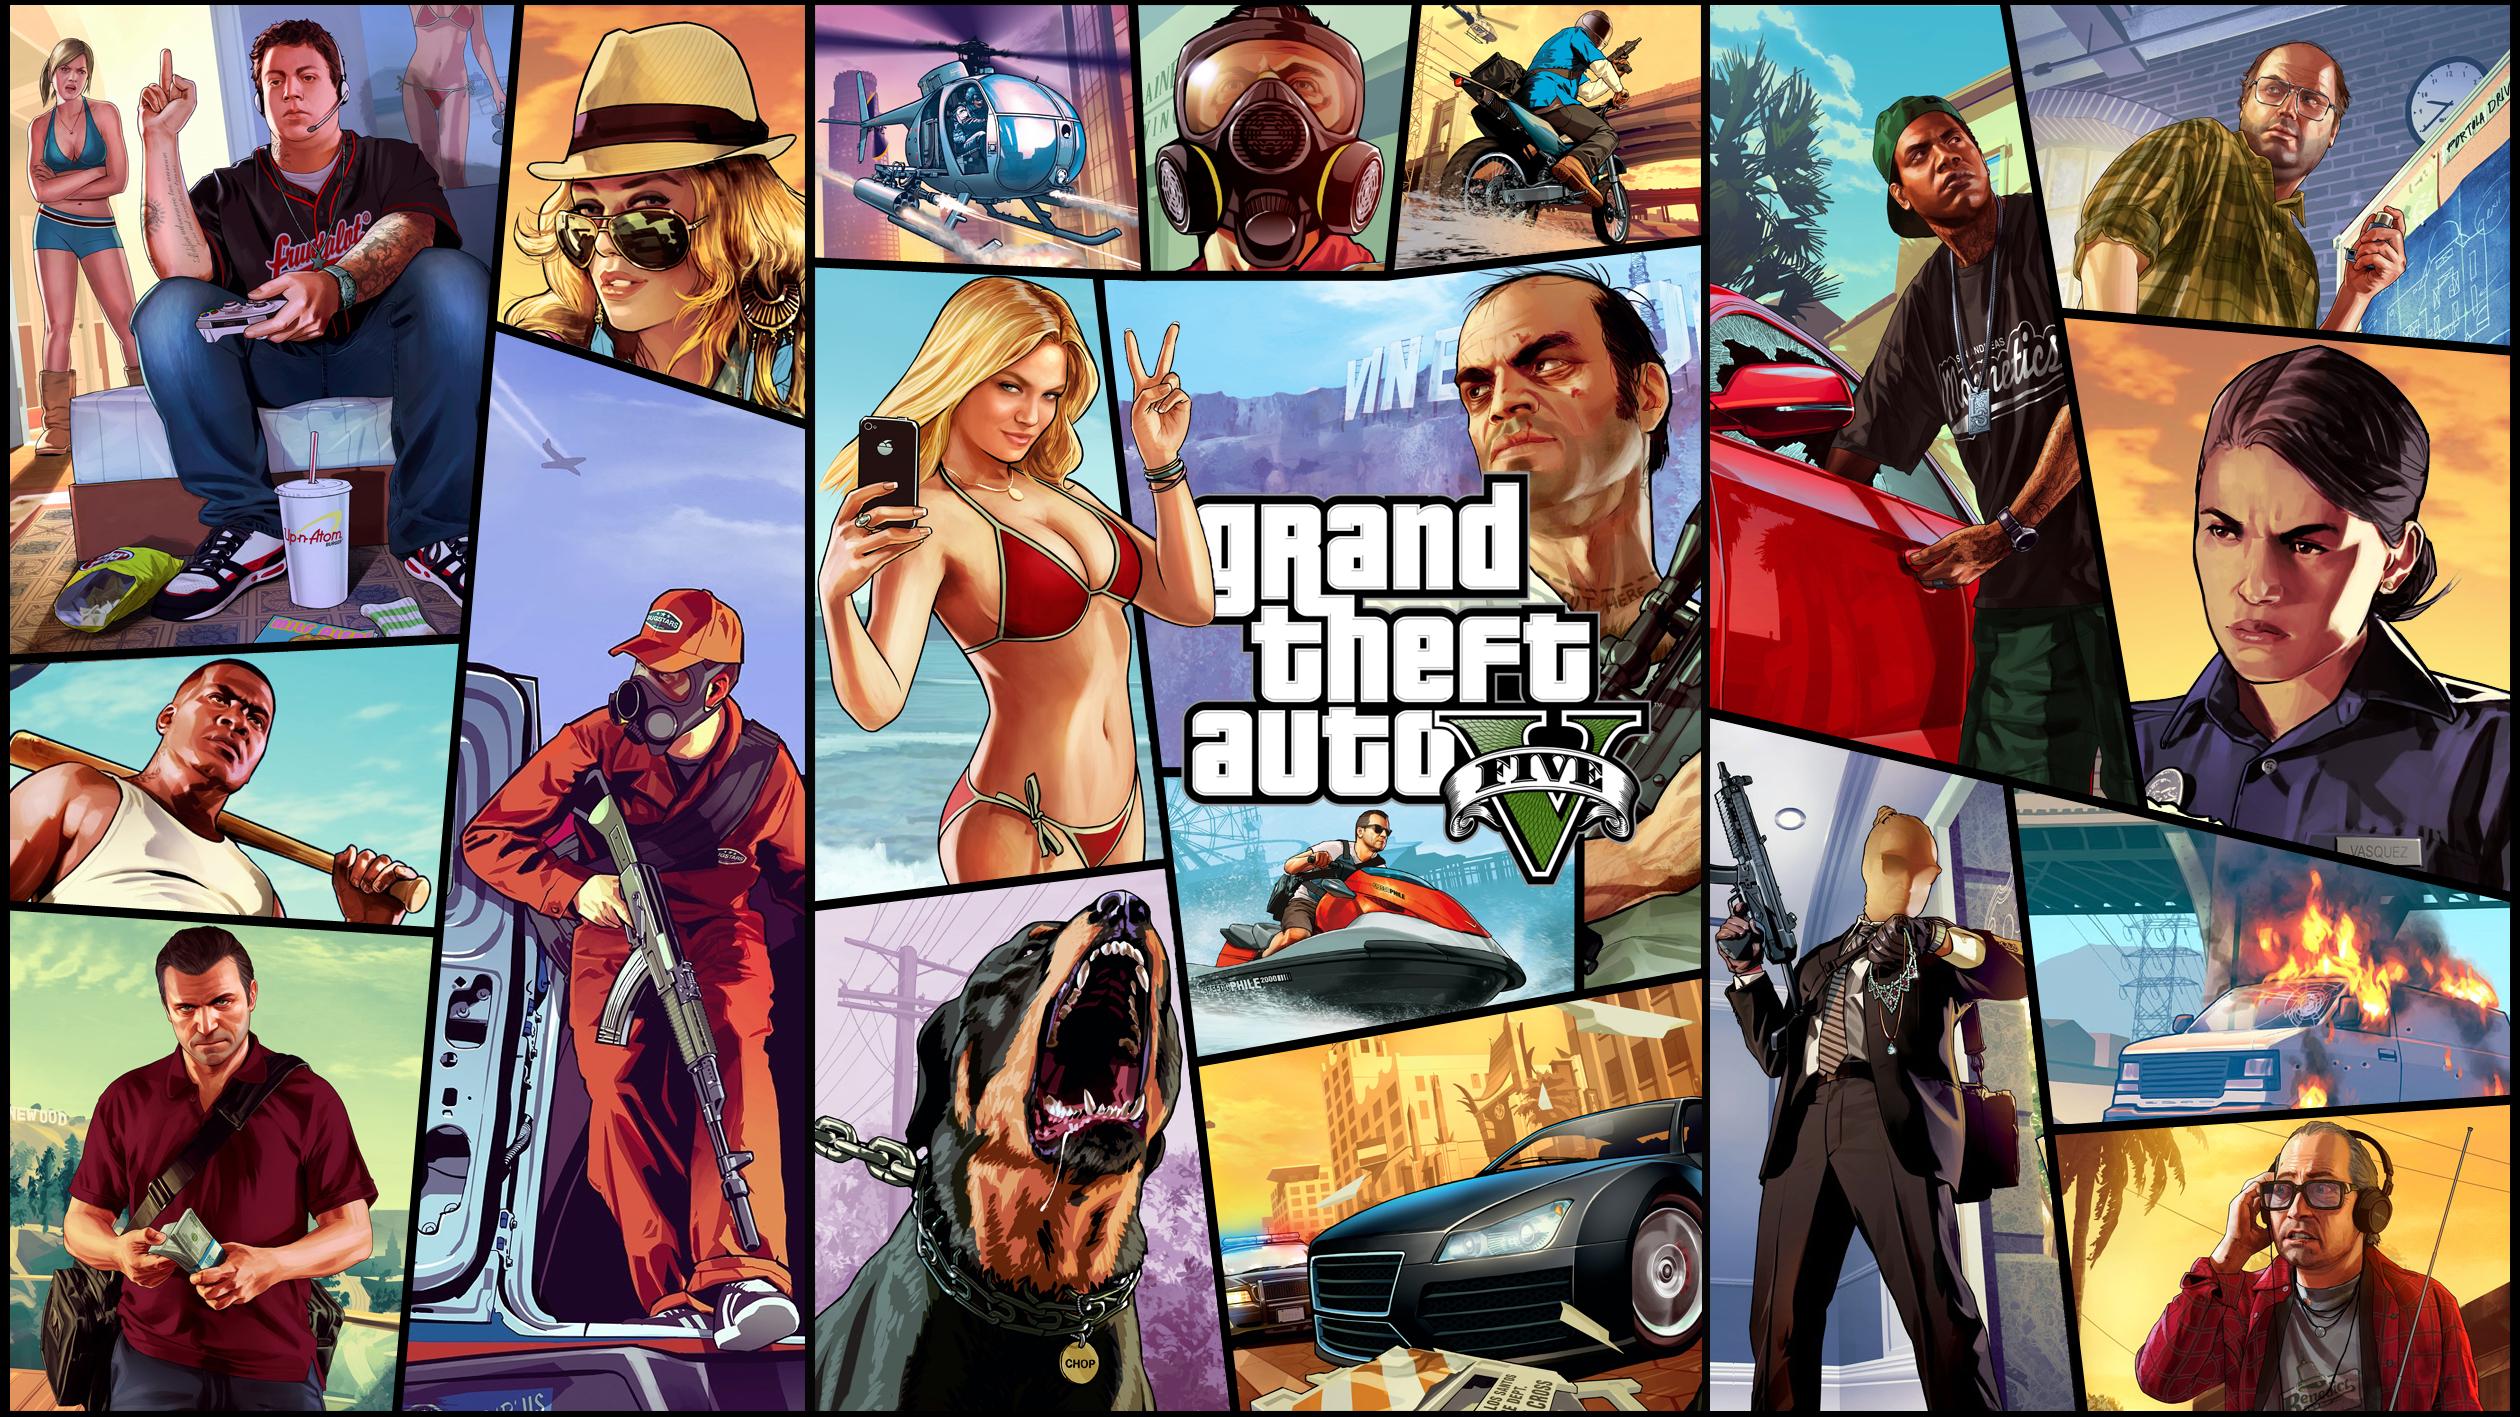 Grand Theft Auto Wallpaper Gta Franklin Michael Trevor Ron 2520x1417